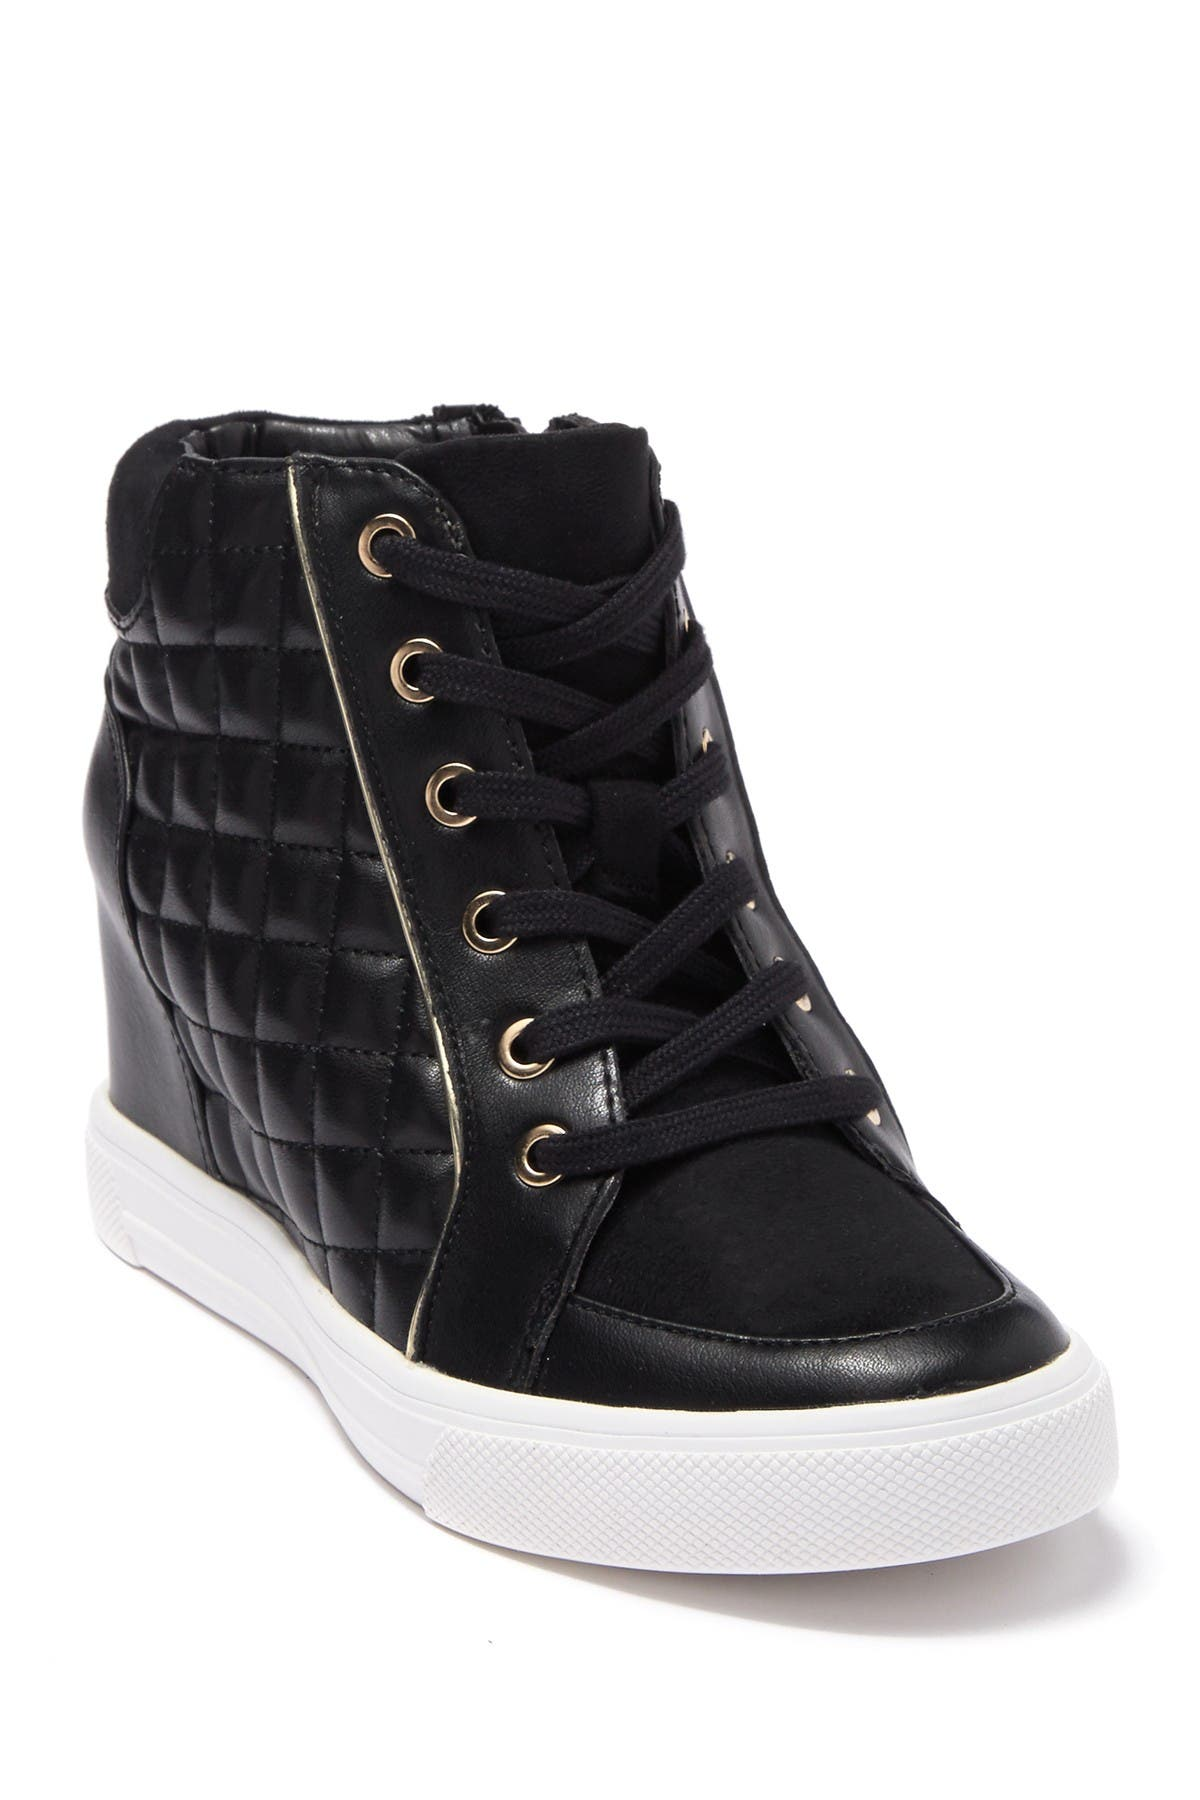 Aldo | Nebrina Wedge Sneaker